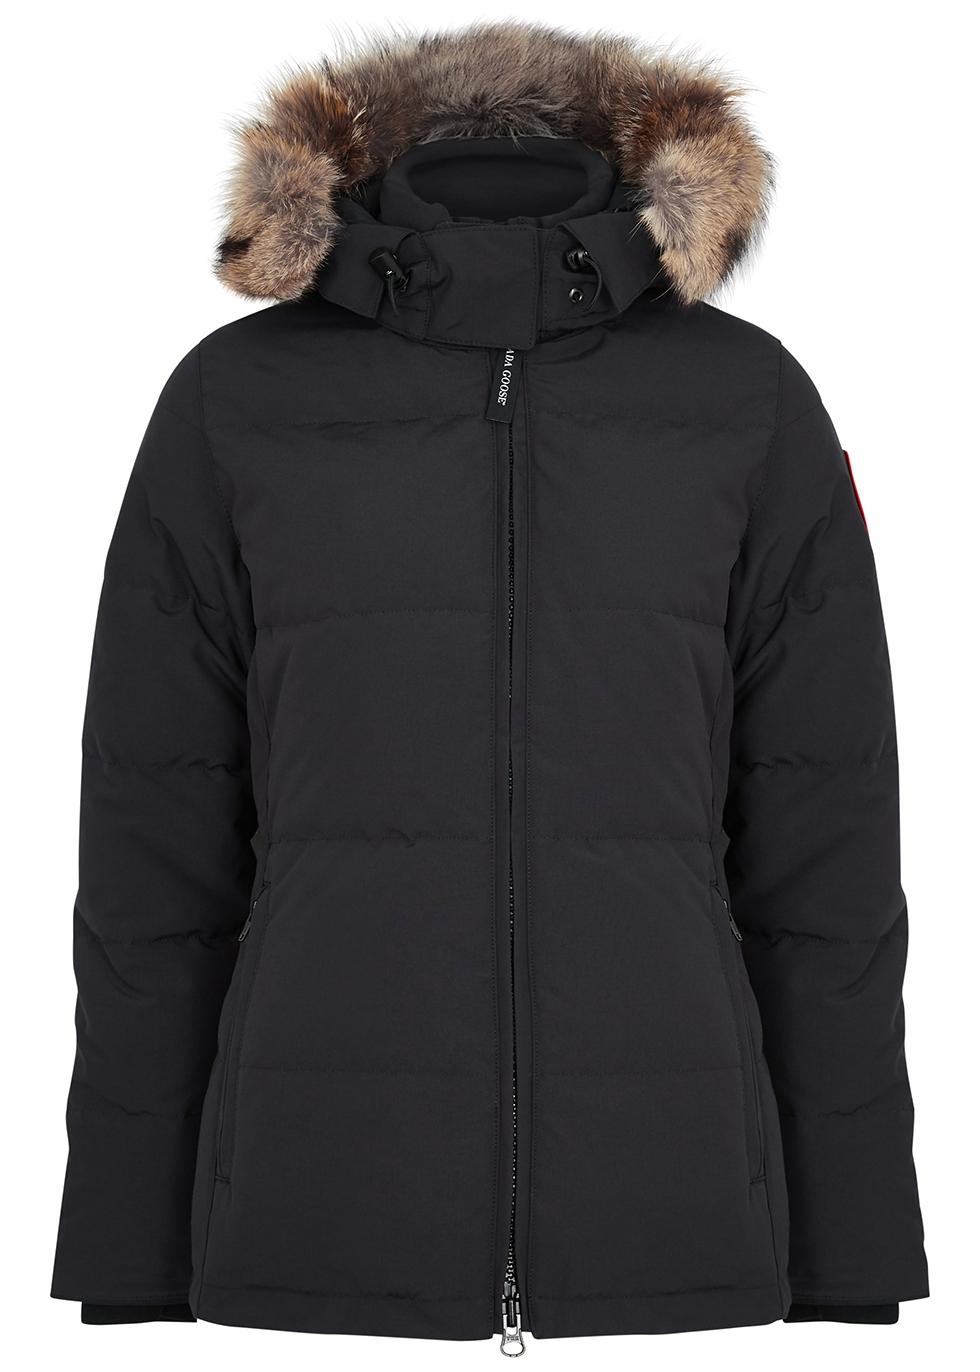 canada goose coat harvey nichols